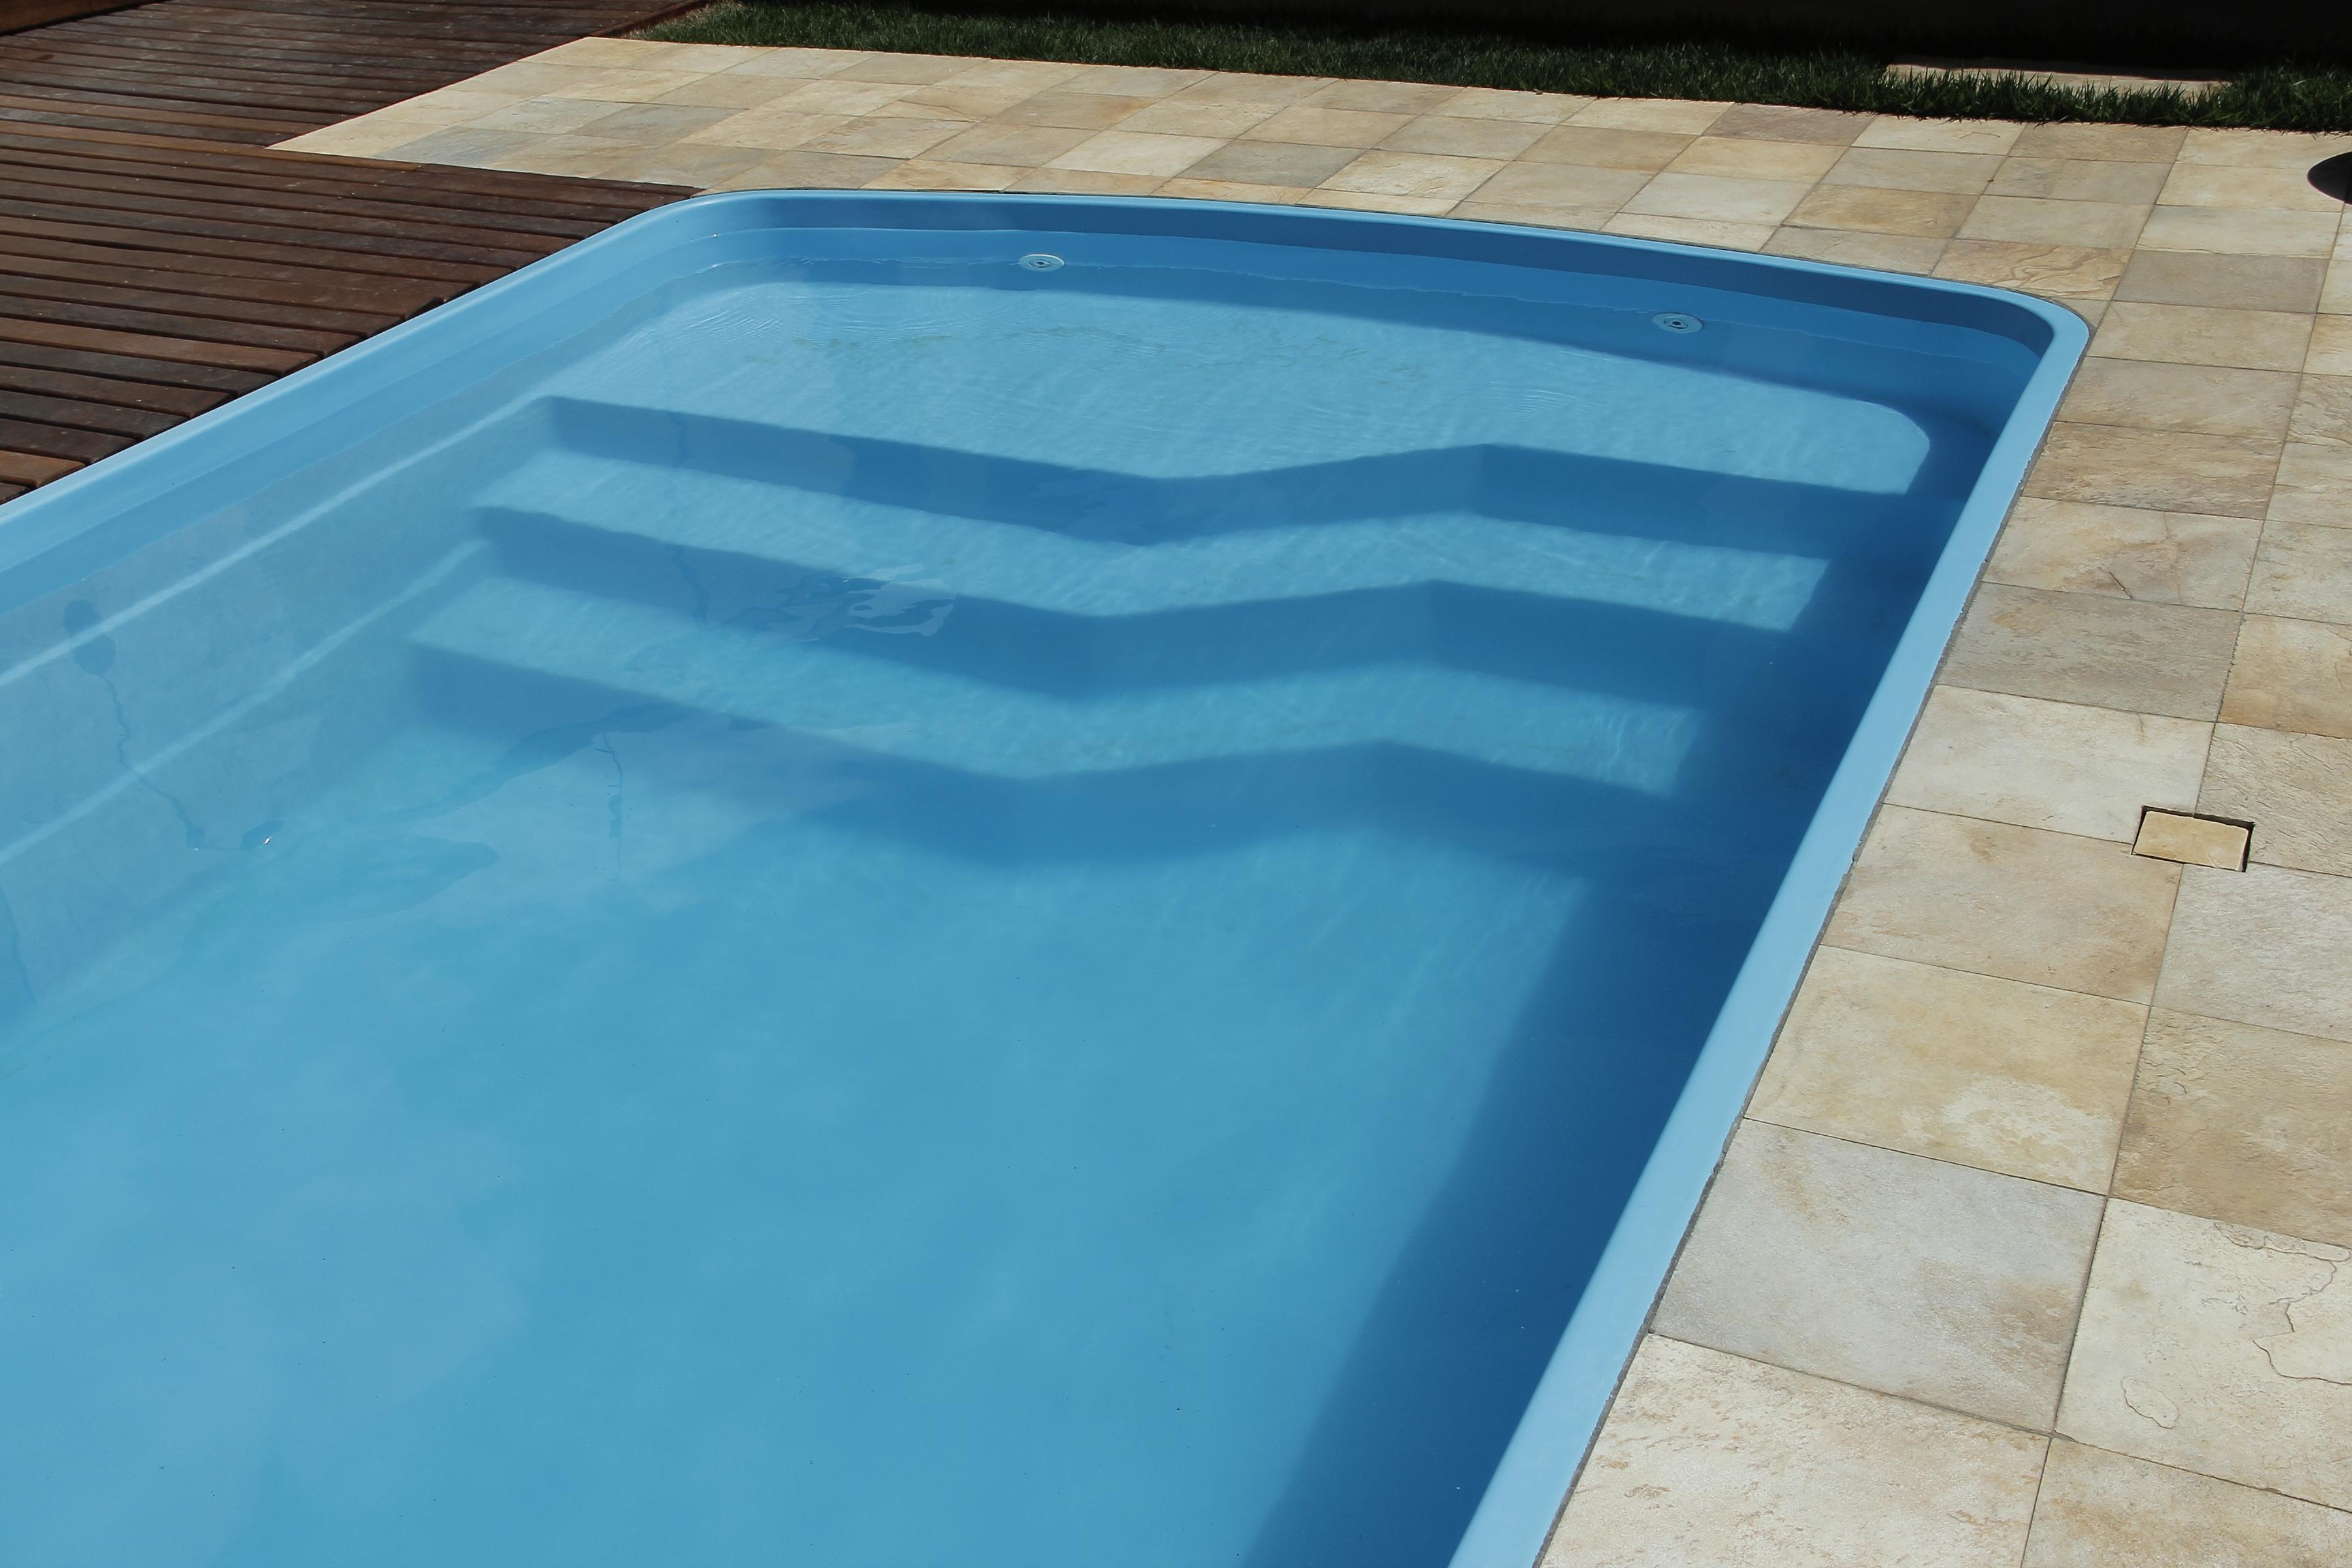 Piscinas de fibra bh mg piscina piscinas bh modelos for Piscina de 6000 litros